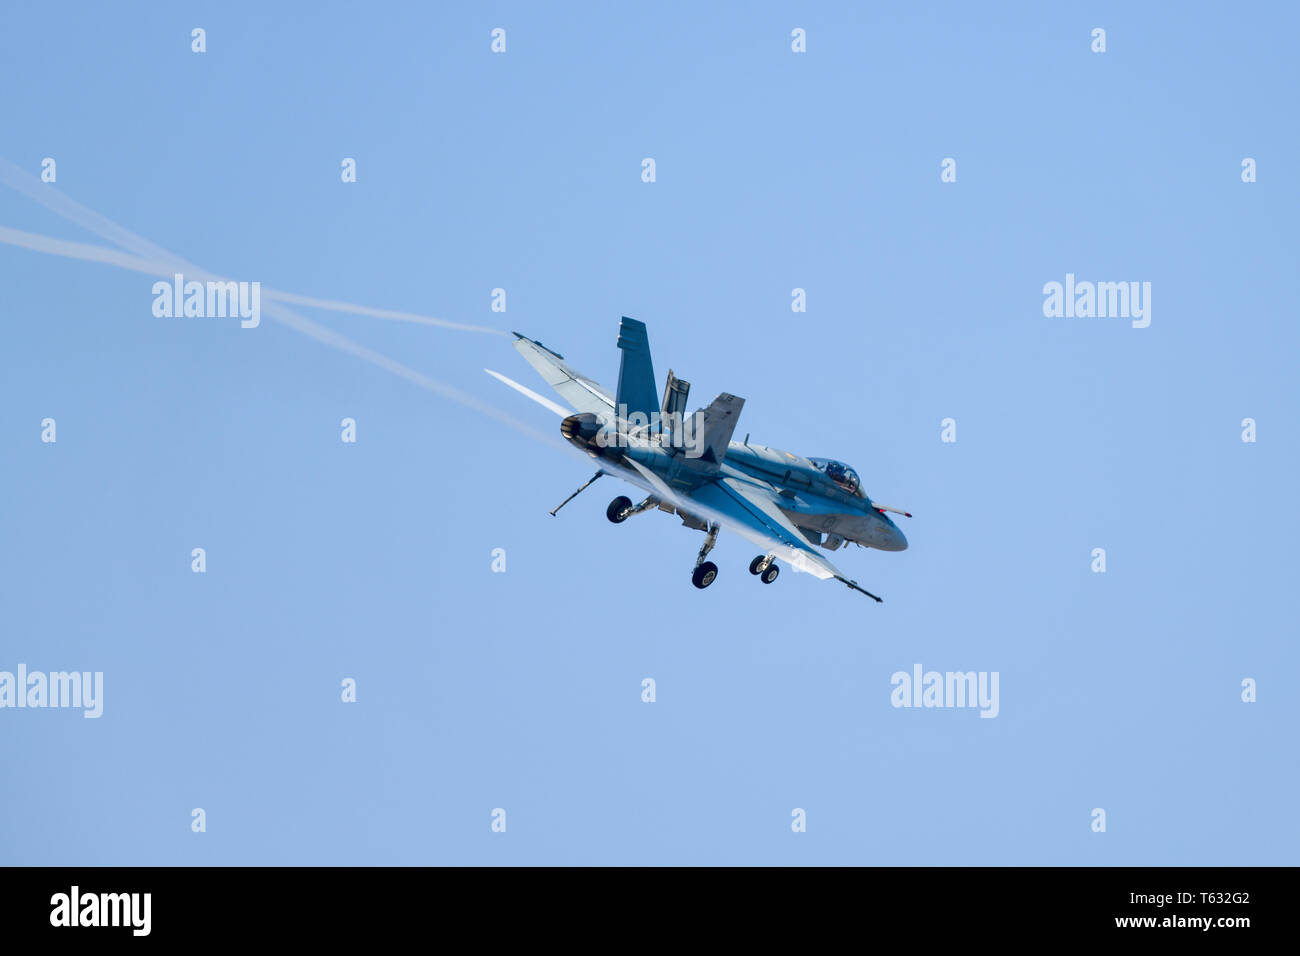 McDonnell Douglas F/A-18 Hornet Fighter Jet - RAAF Royal Australian Airforce - Stock Image